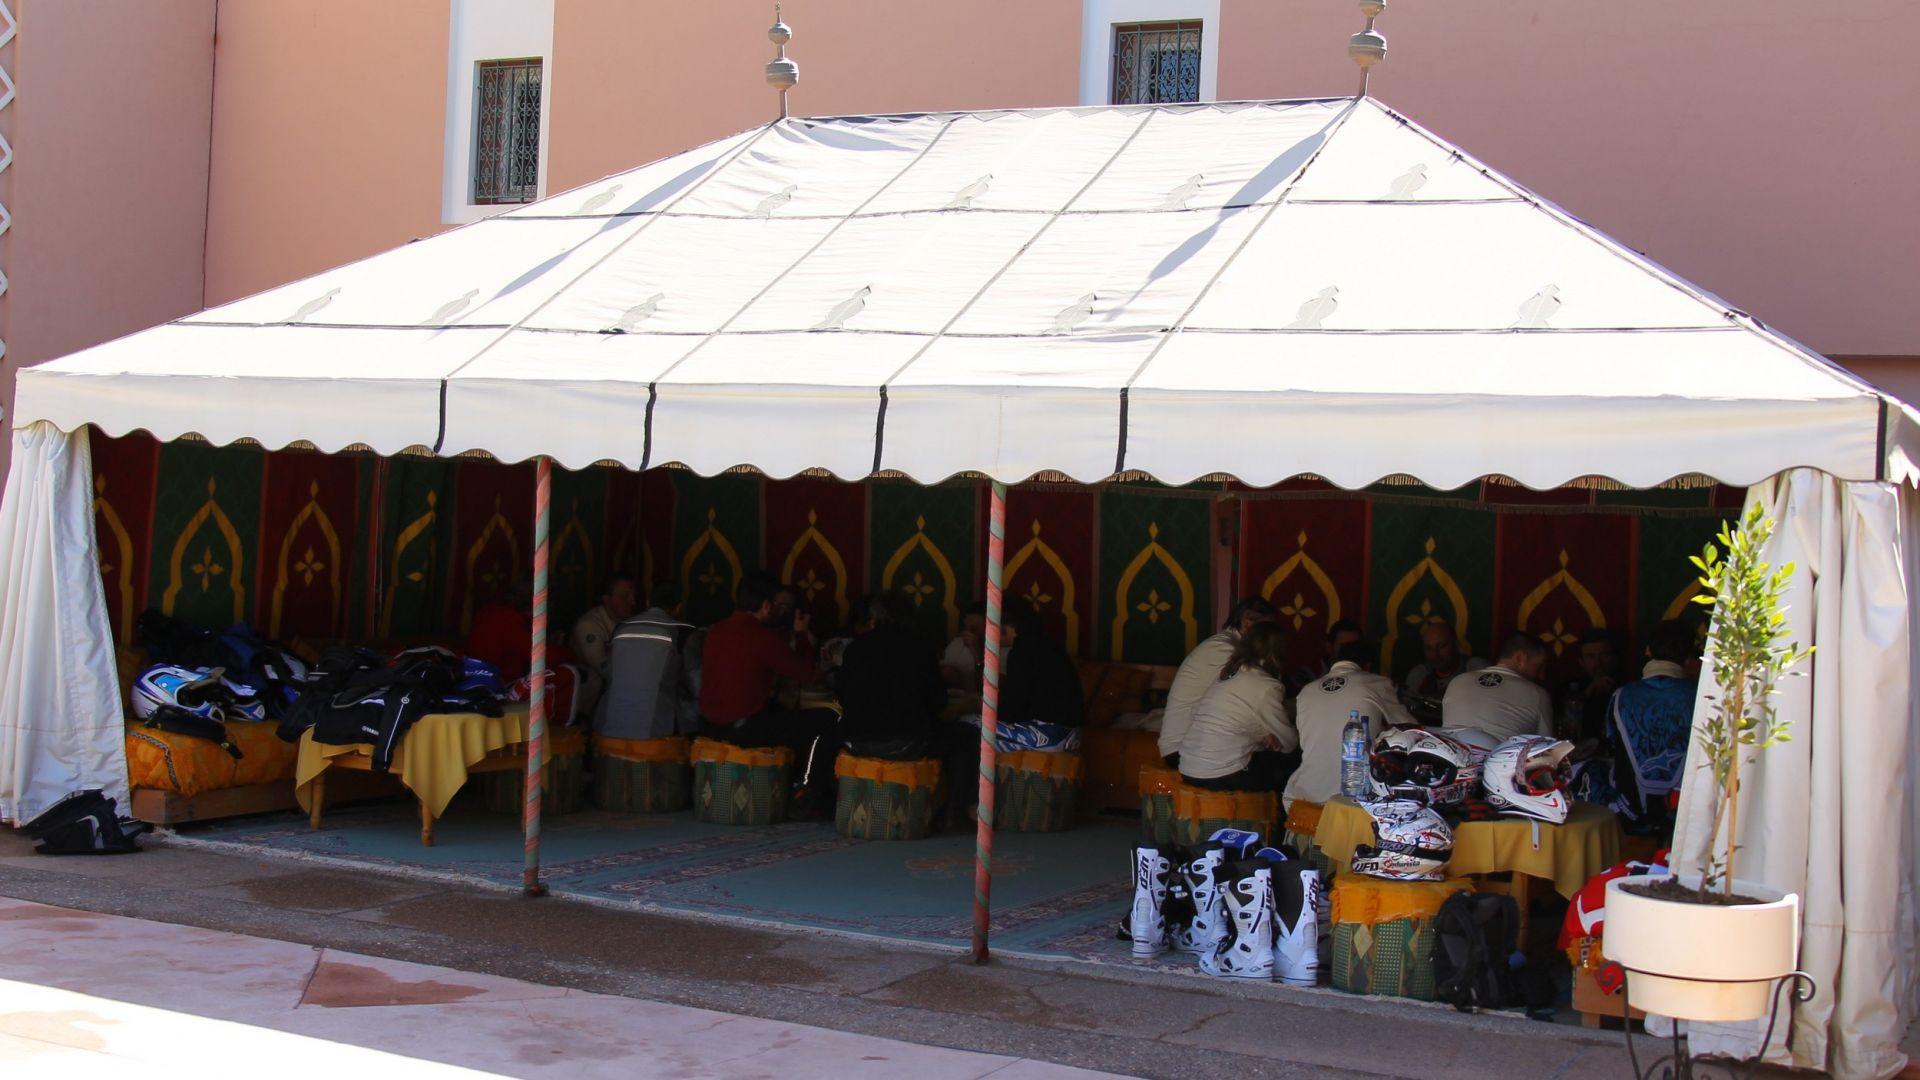 Immagine 58: In Marocco con la Yamaha Super Ténéré